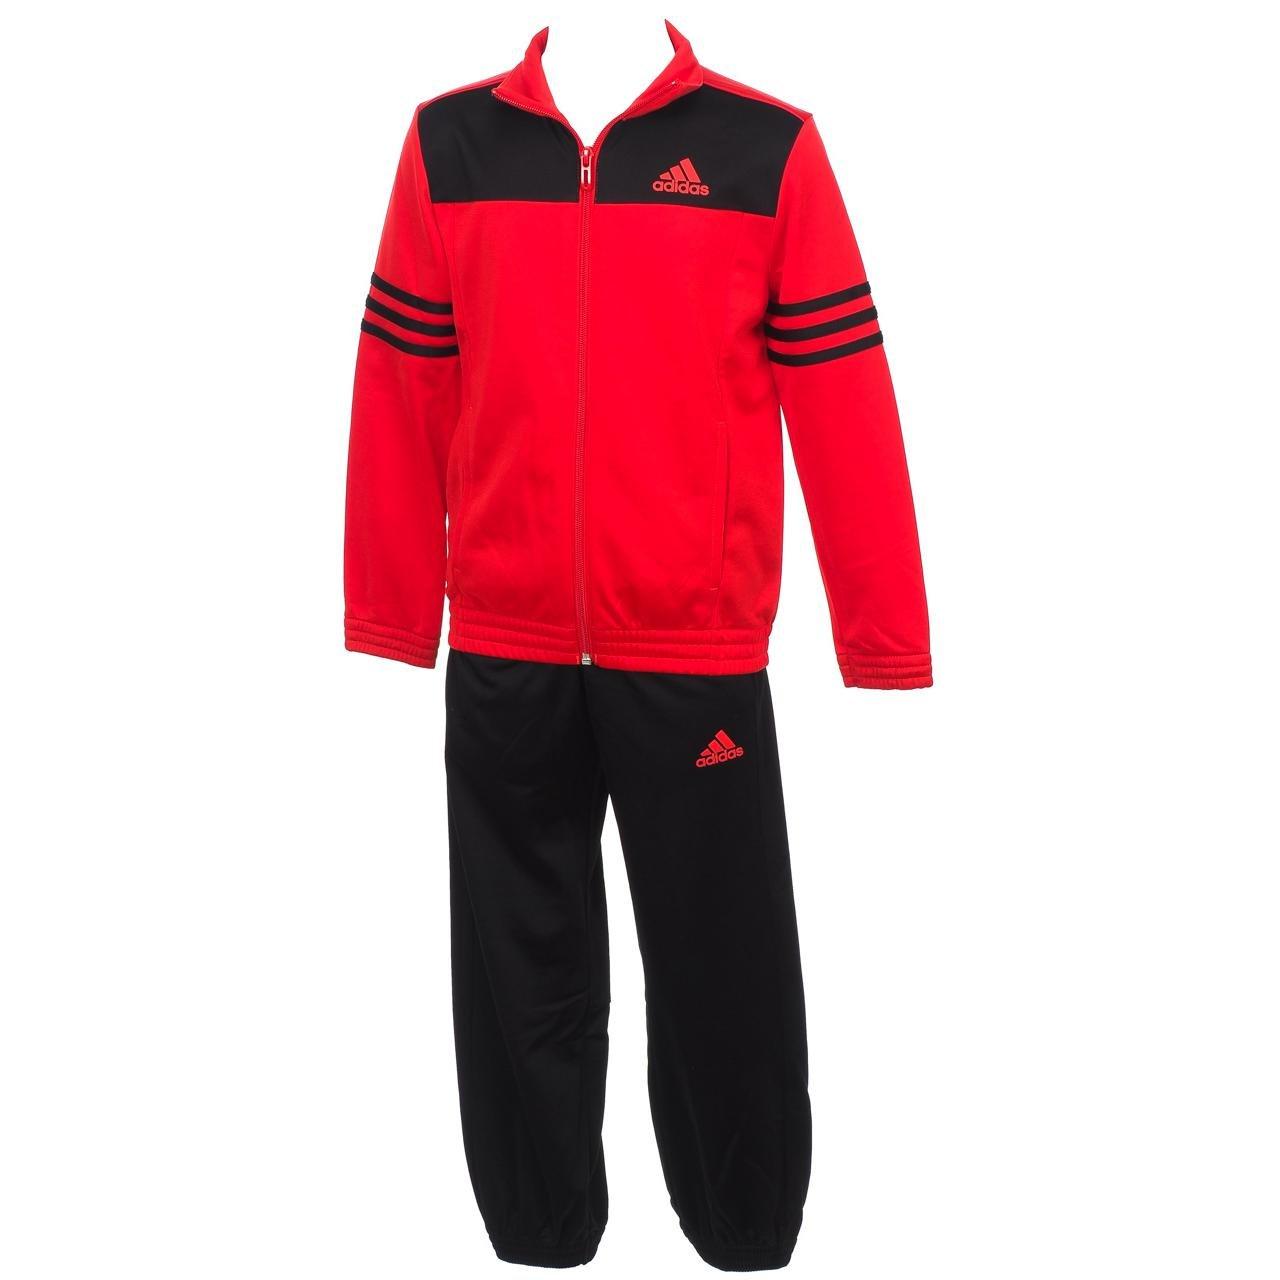 Chándal deporte niño Adidas K Pes Lin TS - 48487 (110): Amazon.es ...